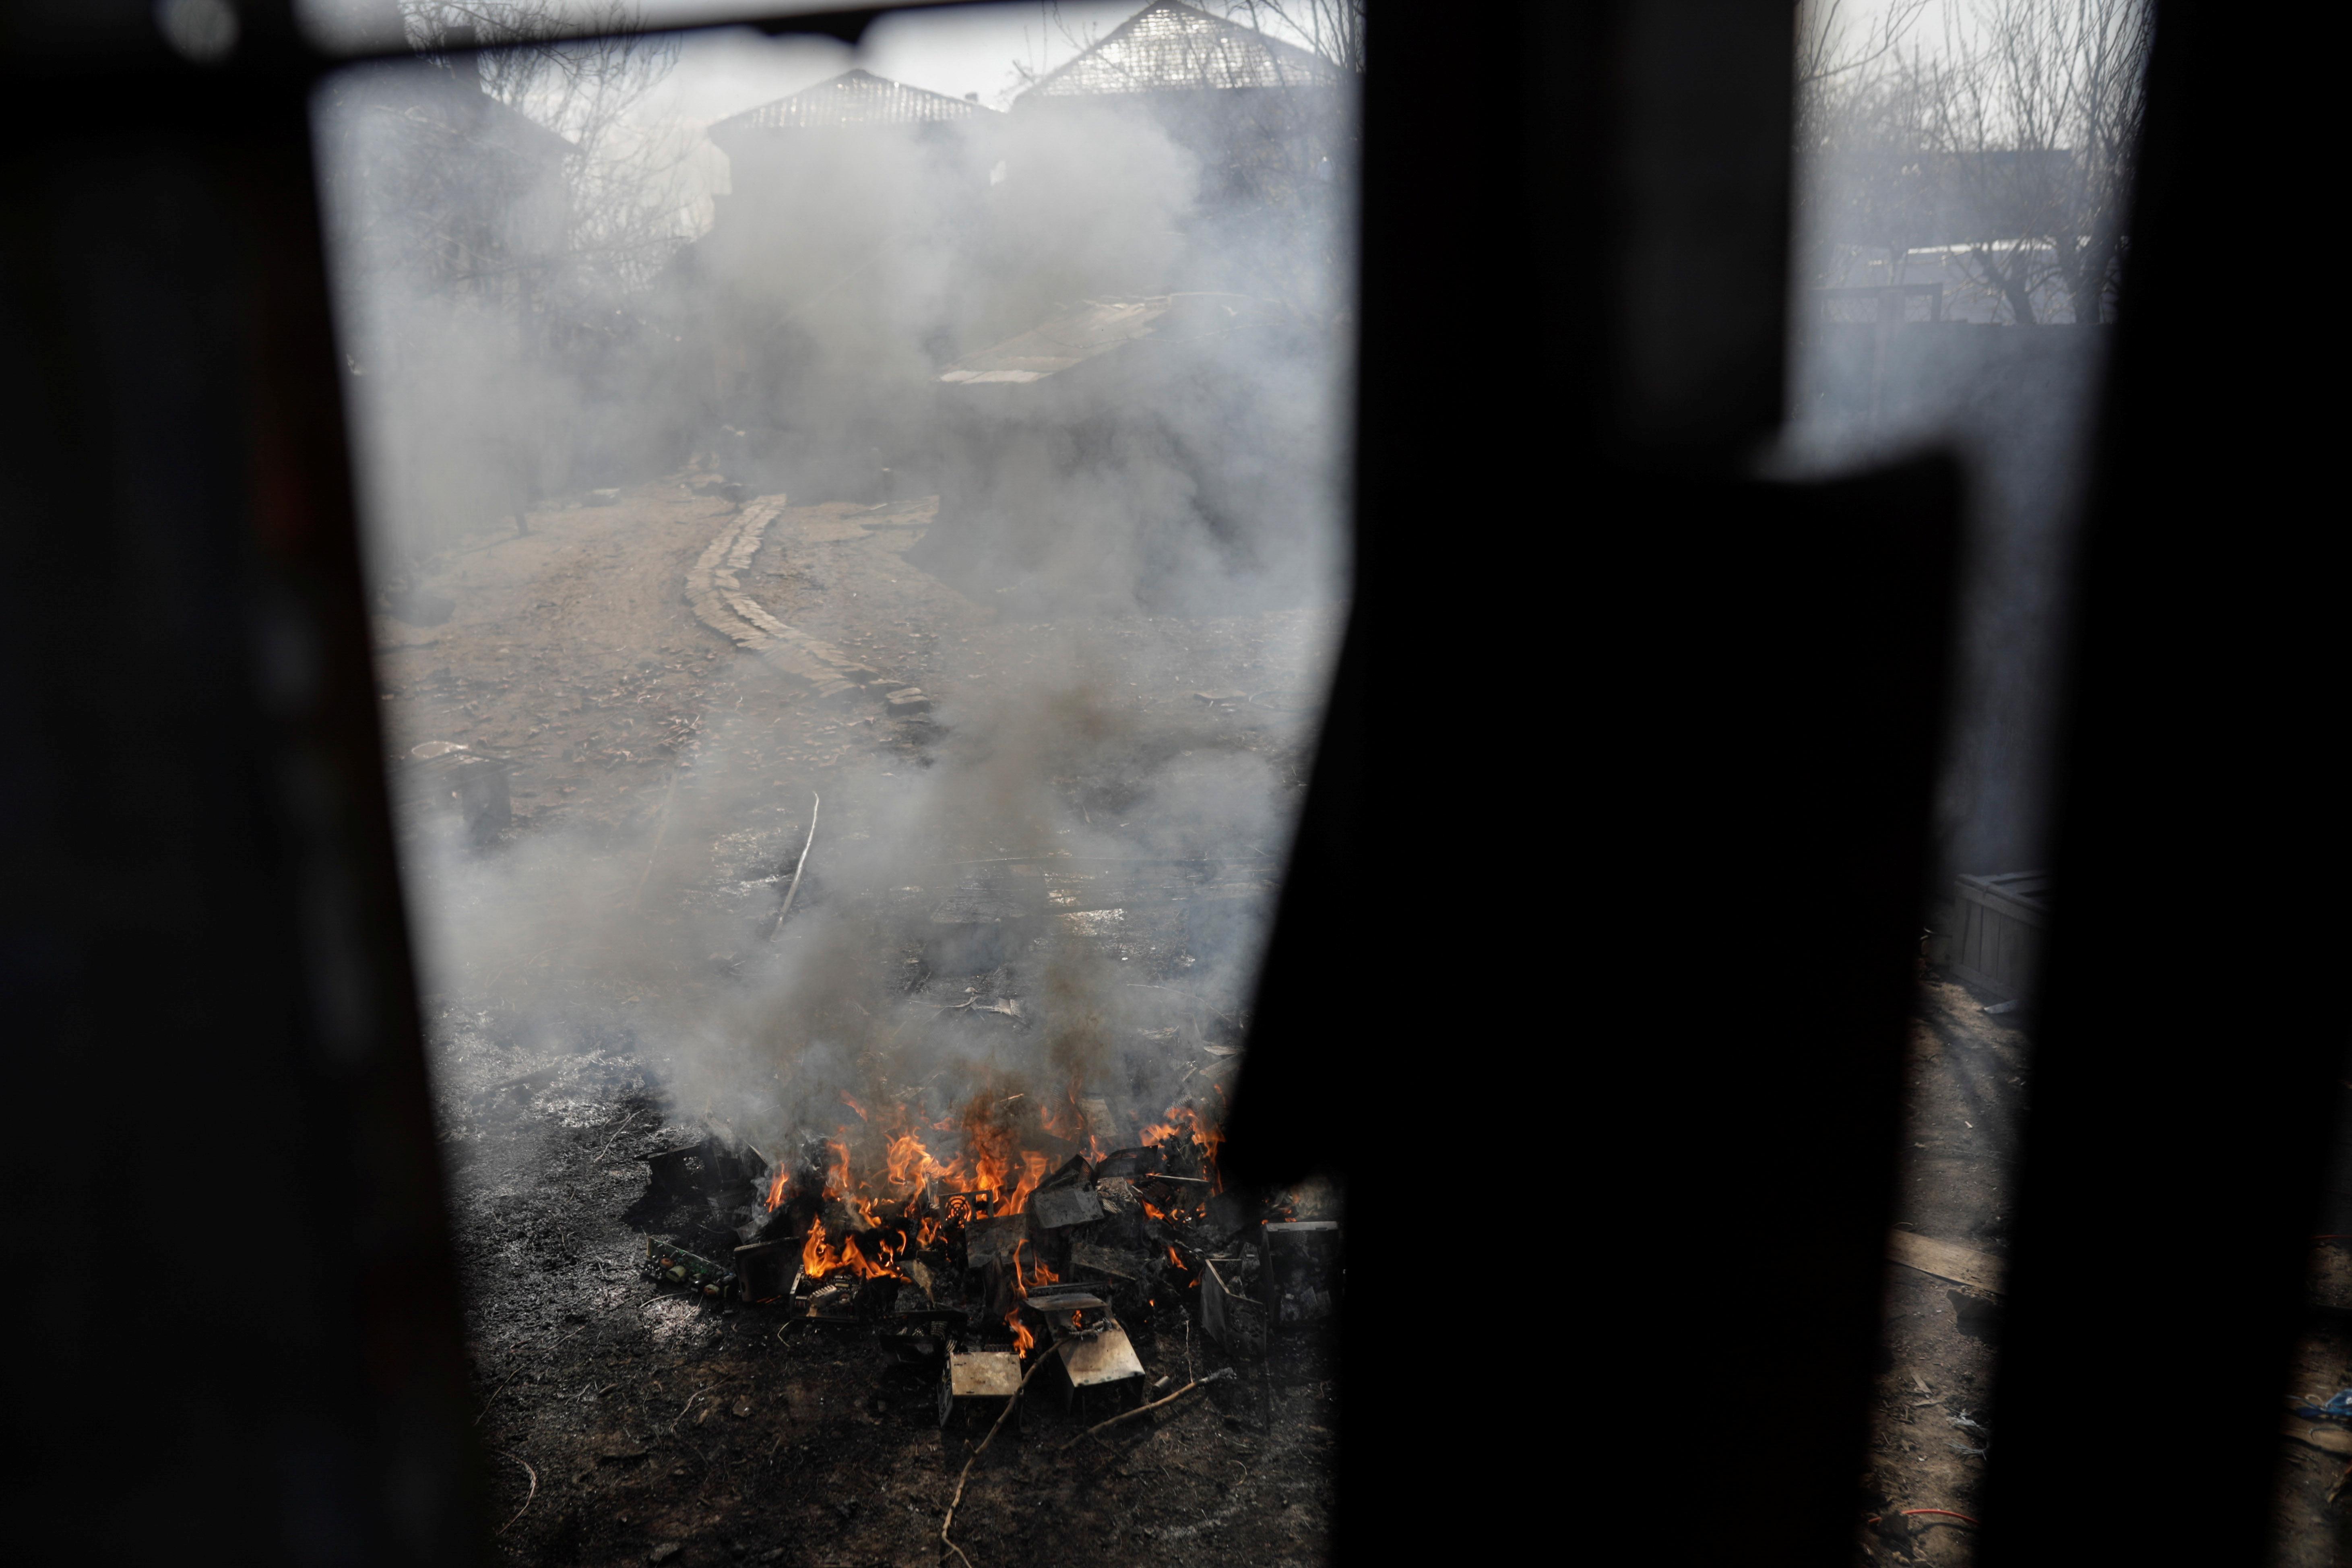 Dismantled electronics burn in a courtyard in Sintesti village, Ilfov, Romania, April 9, 2021. Inquam Photos/George Calin via REUTERS